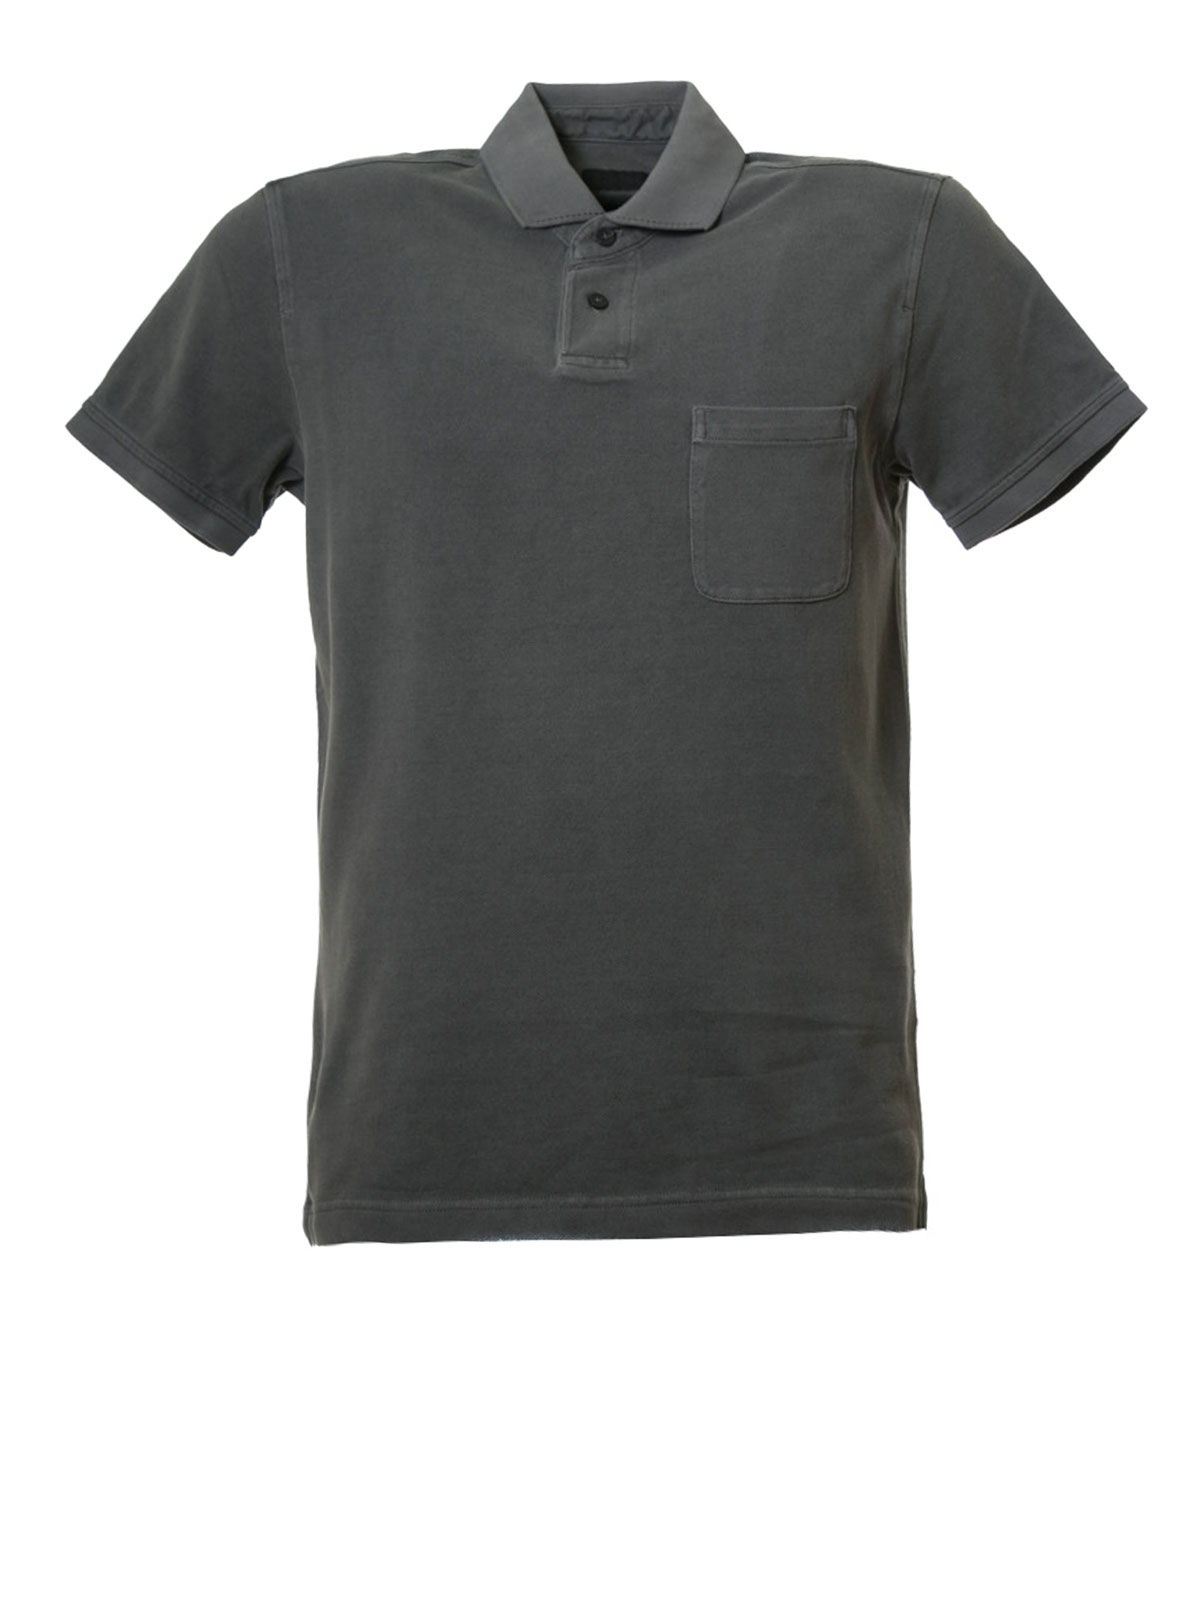 Cotton piquet polo shirt by z zegna polo shirts ikrix for Zegna polo shirts sale